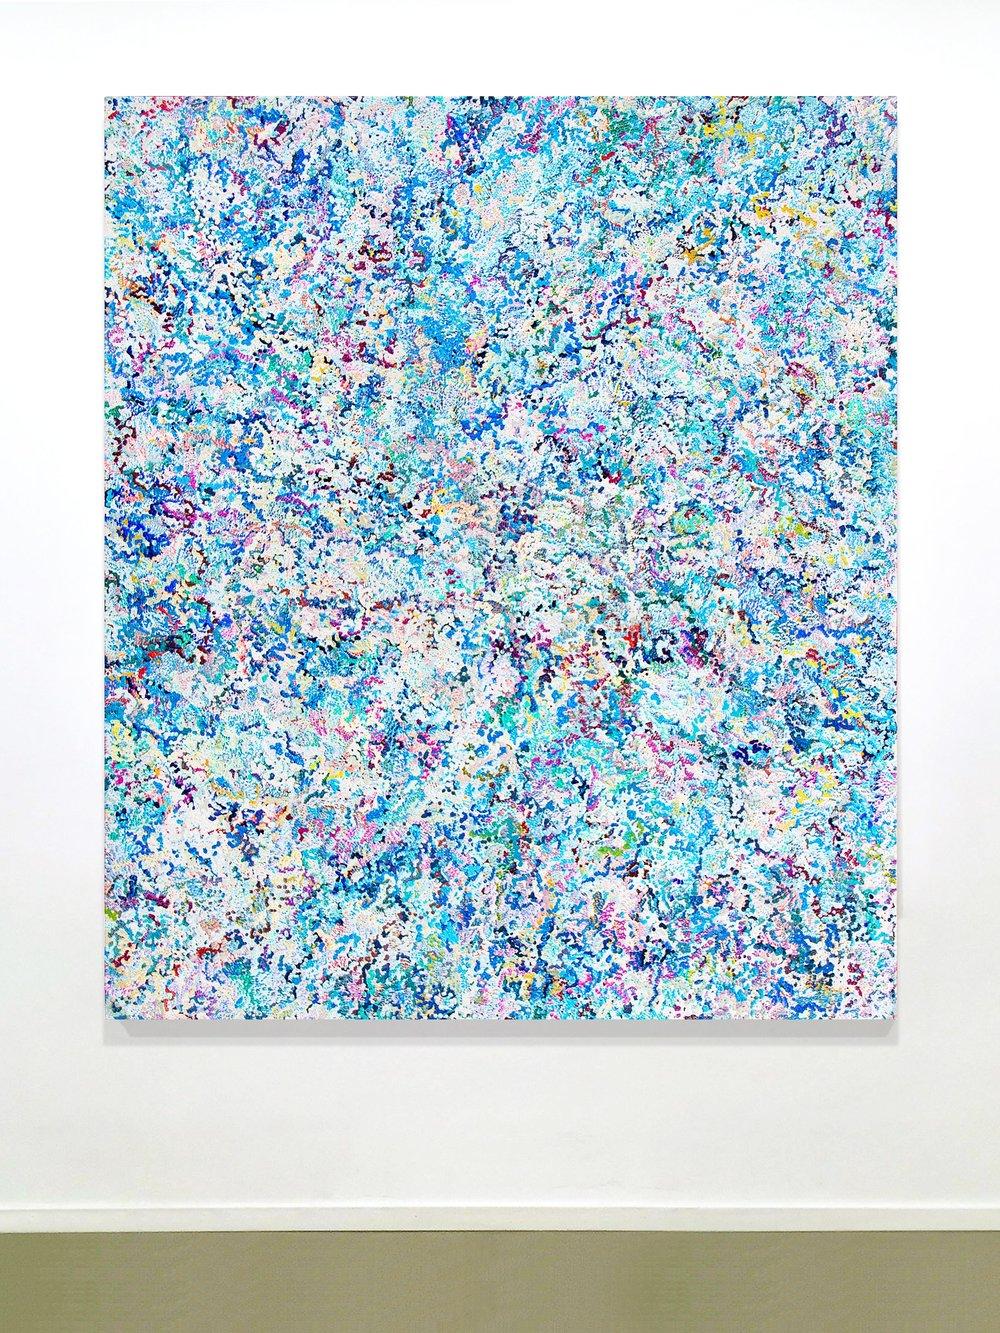 1st Amalgamation, acrylic on canvas, 2016, 60 x 70in   152 x 178cm